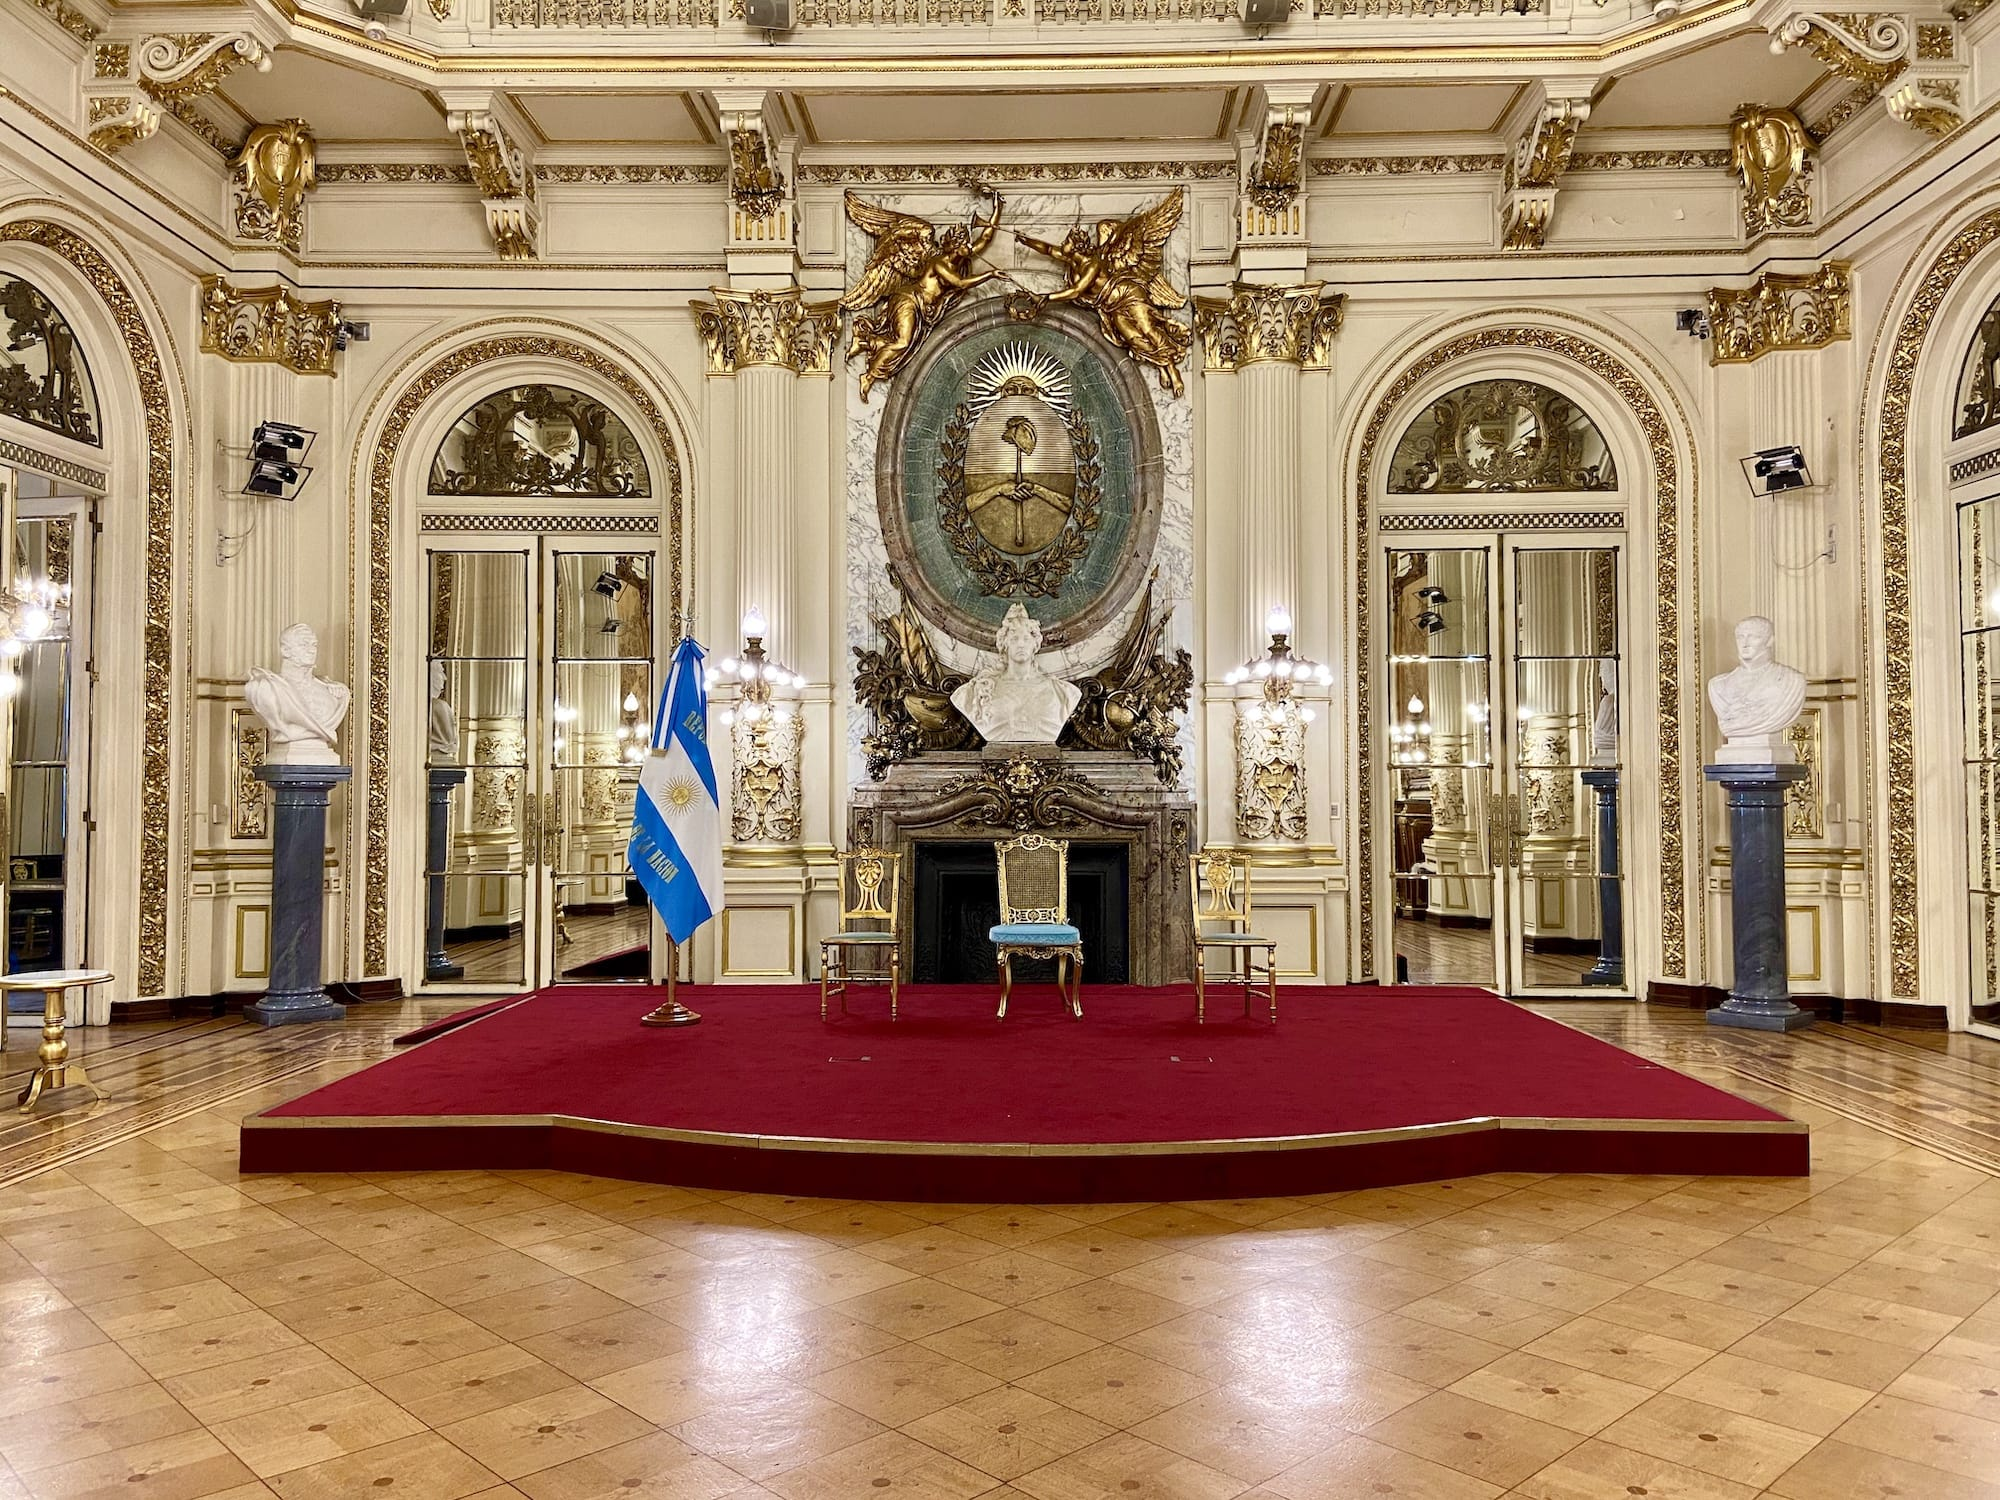 Salon Blanco Casa Rosada Argentina Presidential Palace